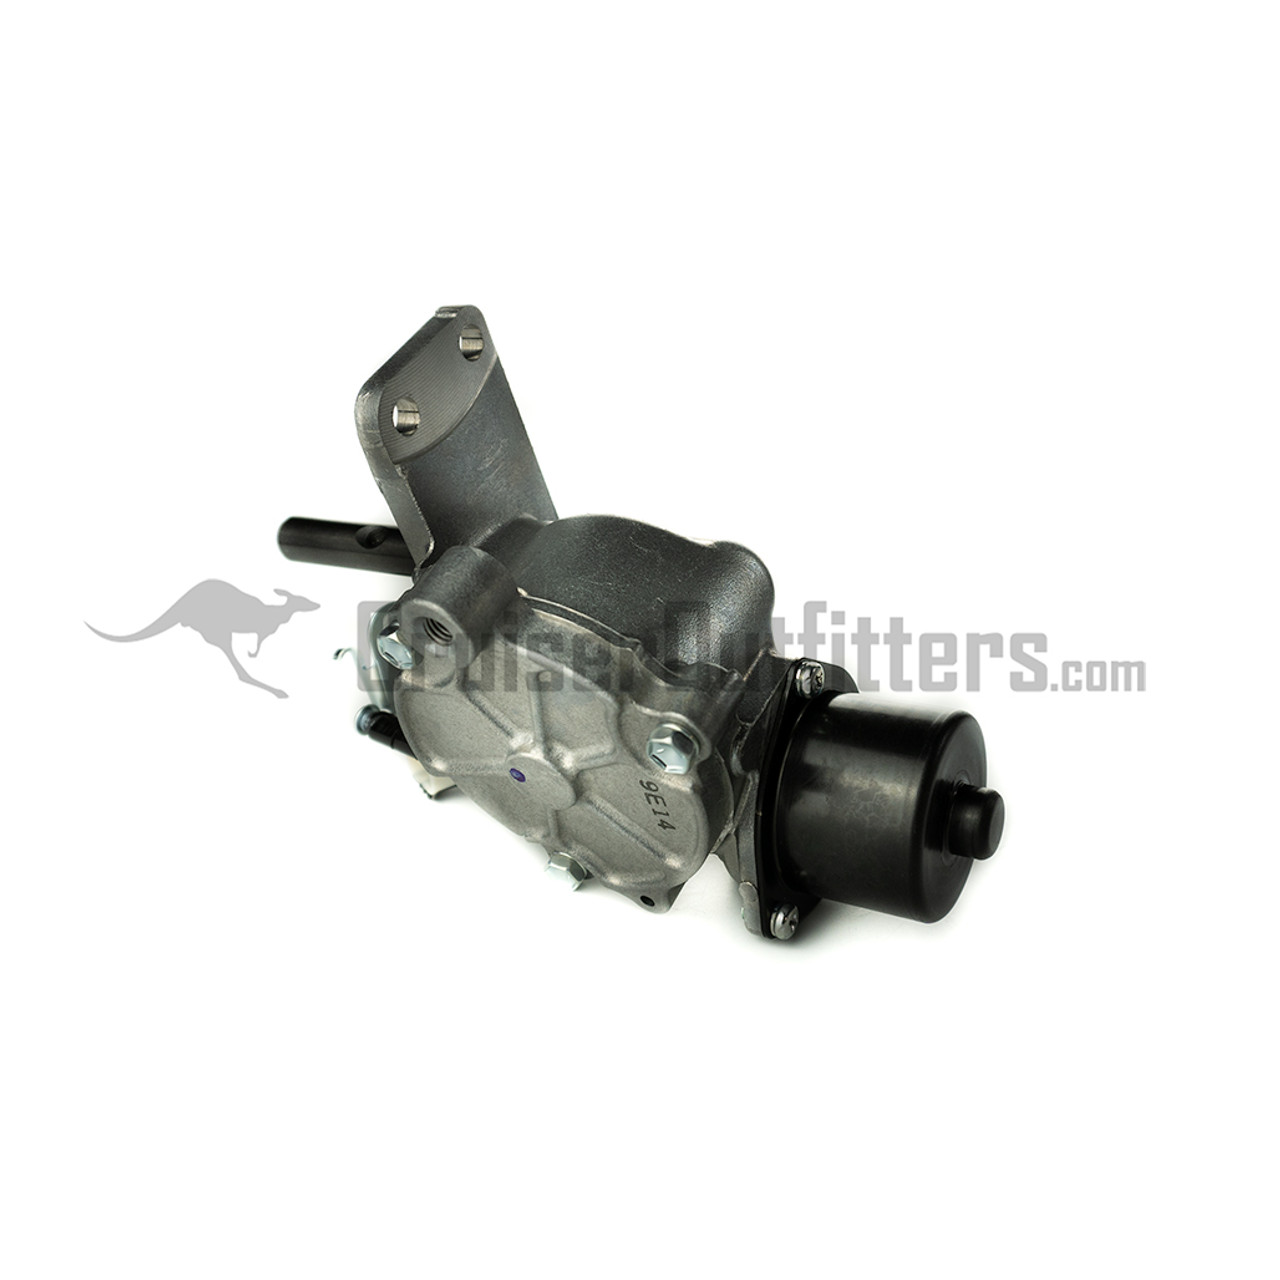 "DIFF60042 - AISIN REAR 9.5"" LC E-Locker Actuator Assembly"